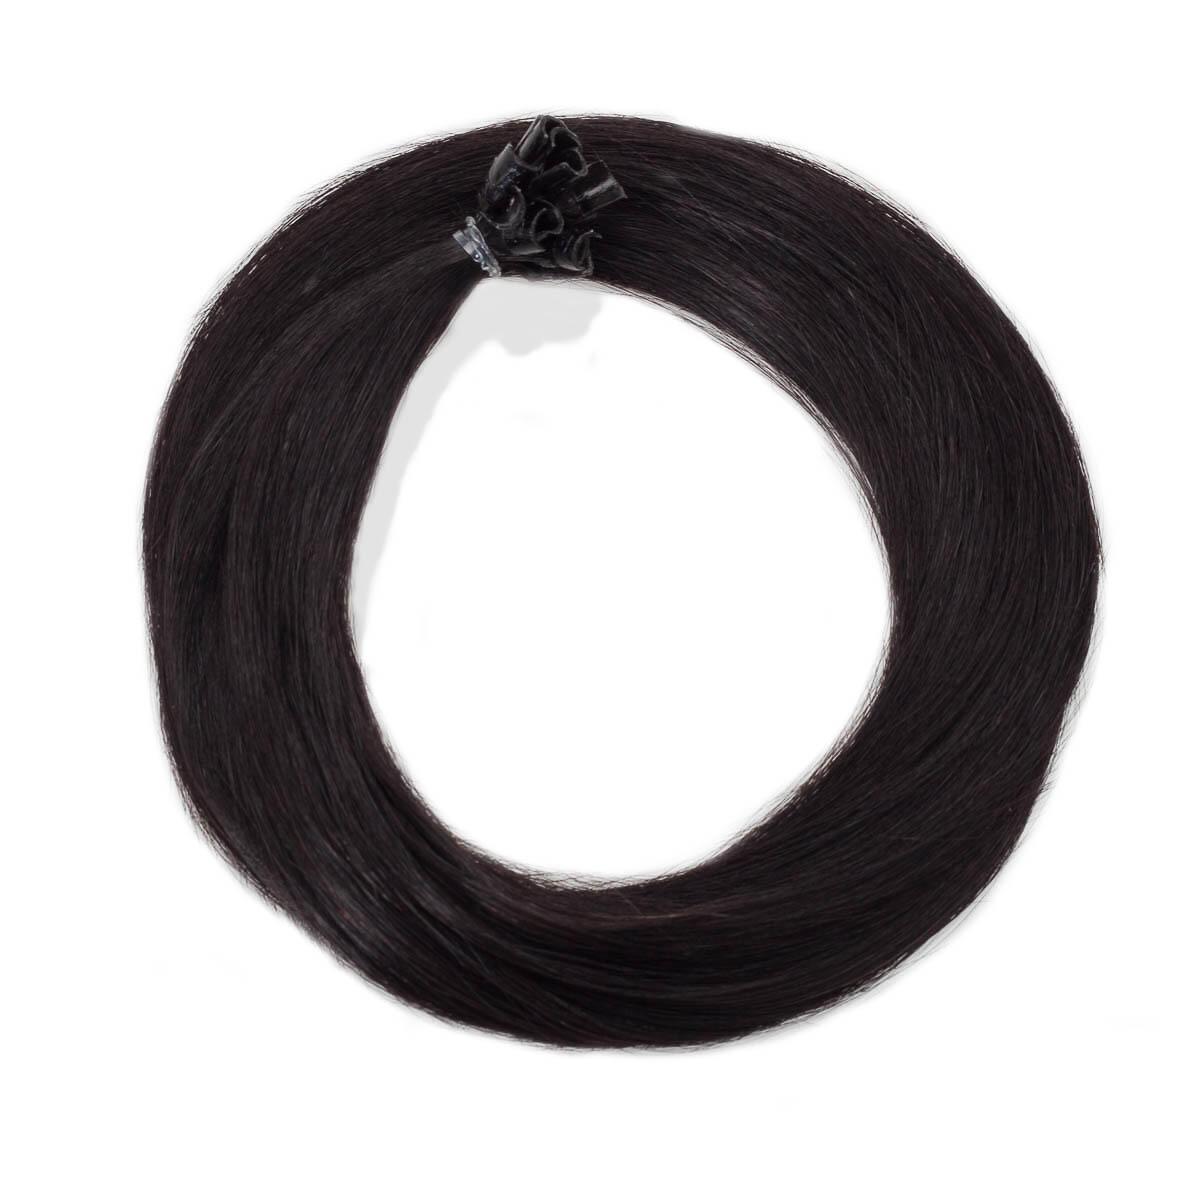 Nail Hair Original 1.2 Black Brown 70 cm